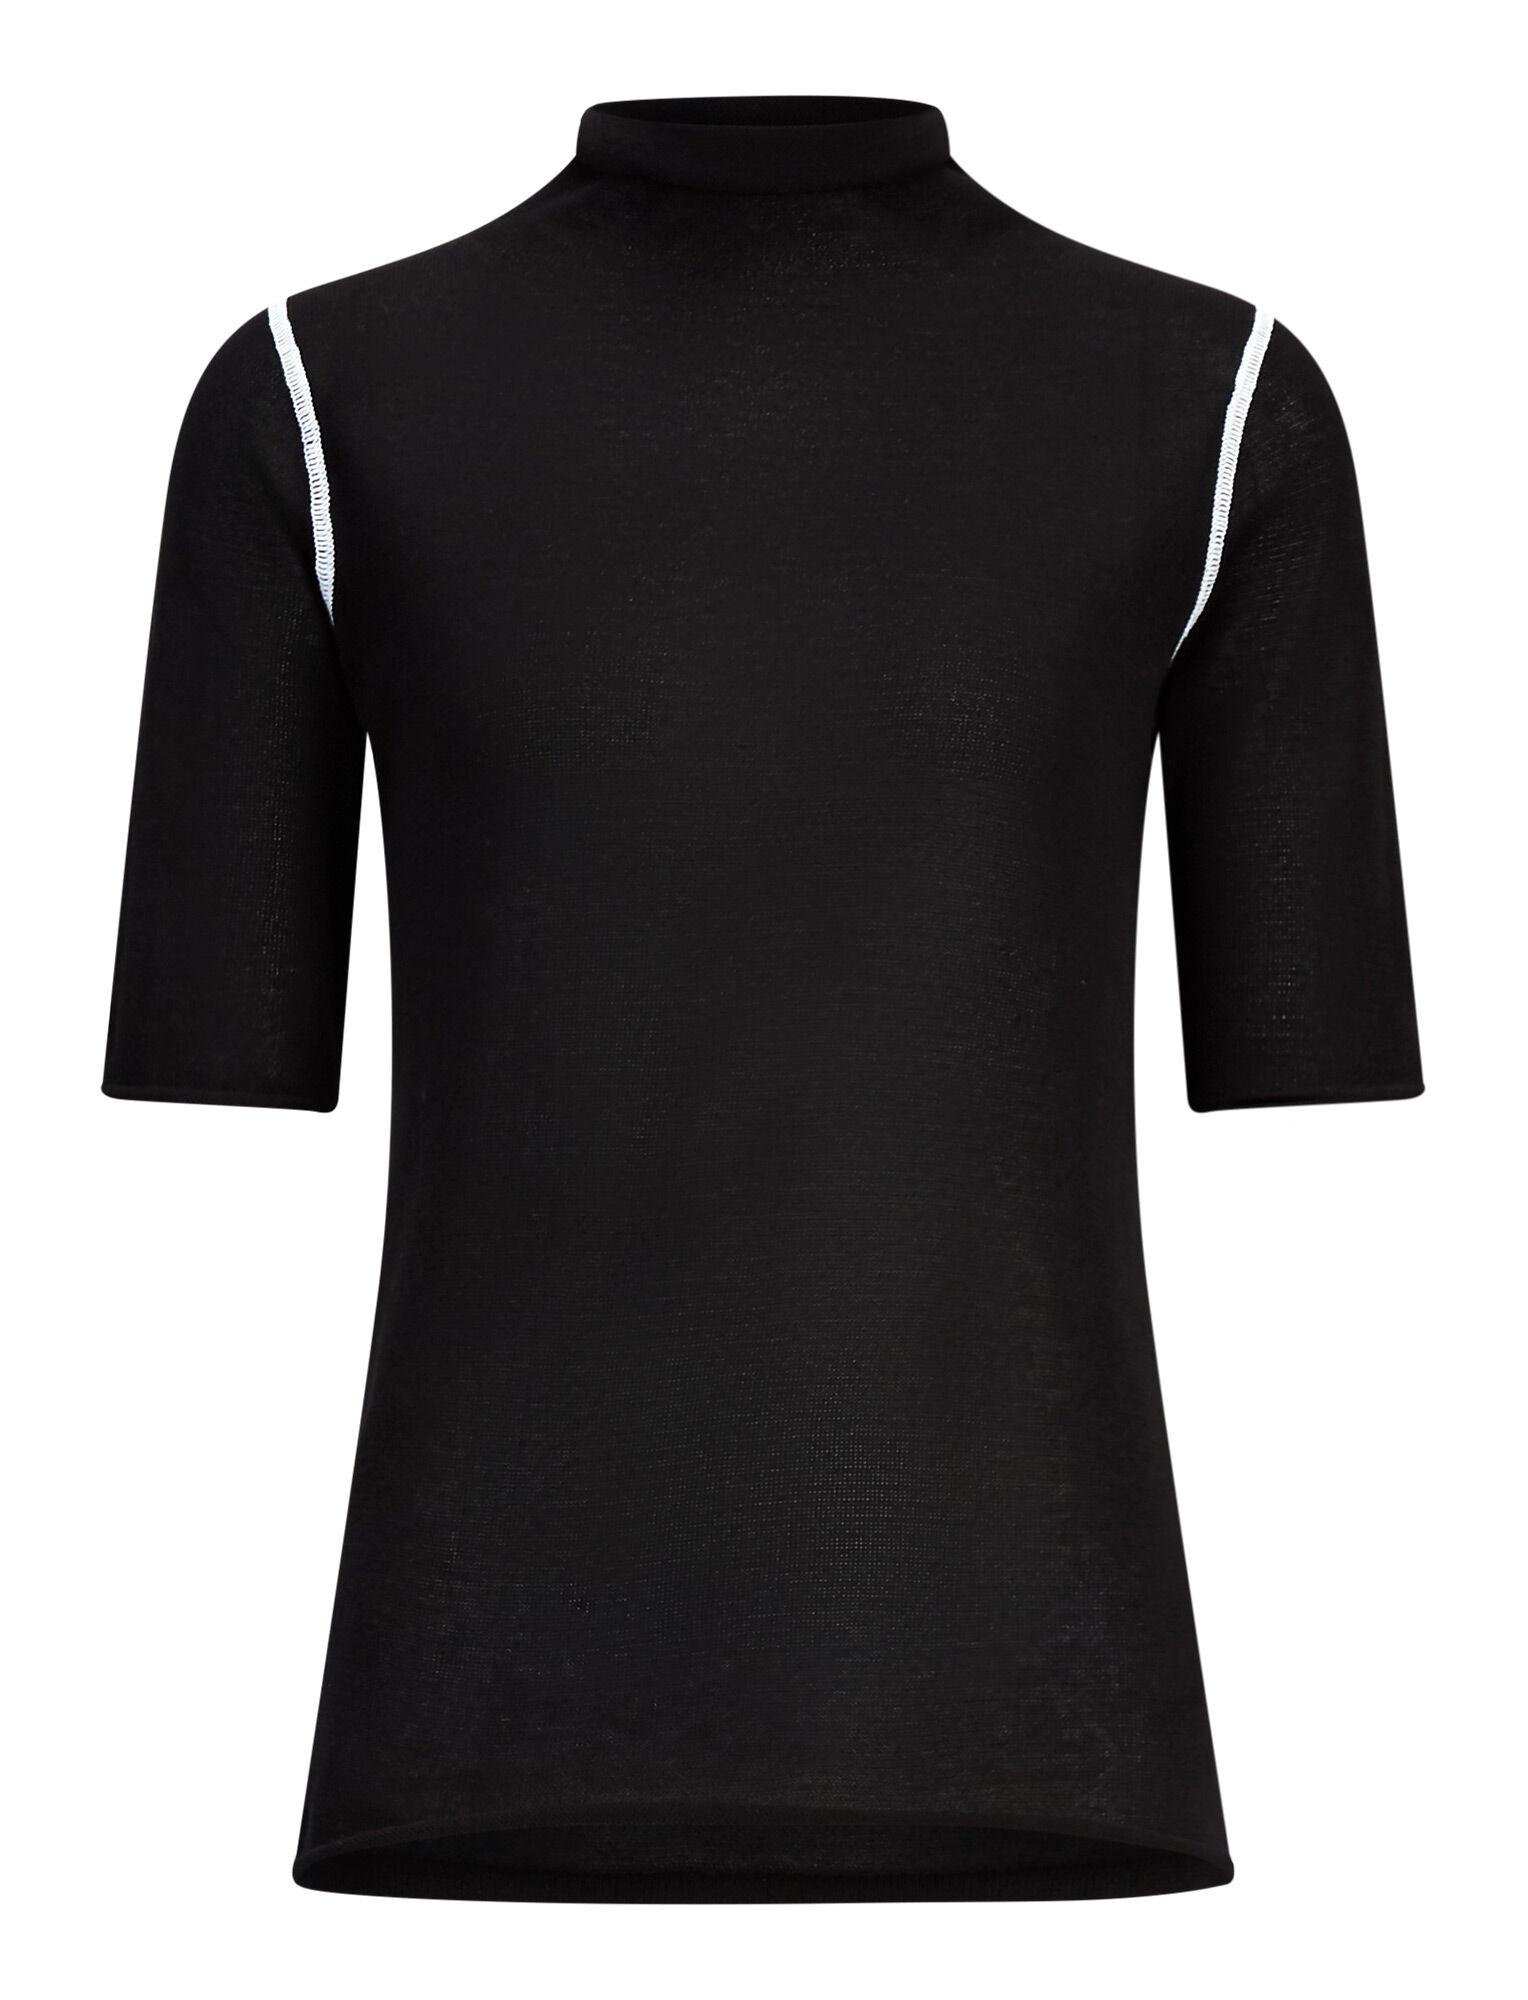 Joseph, High Neck Light Cotton Knit Tee, in BLACK